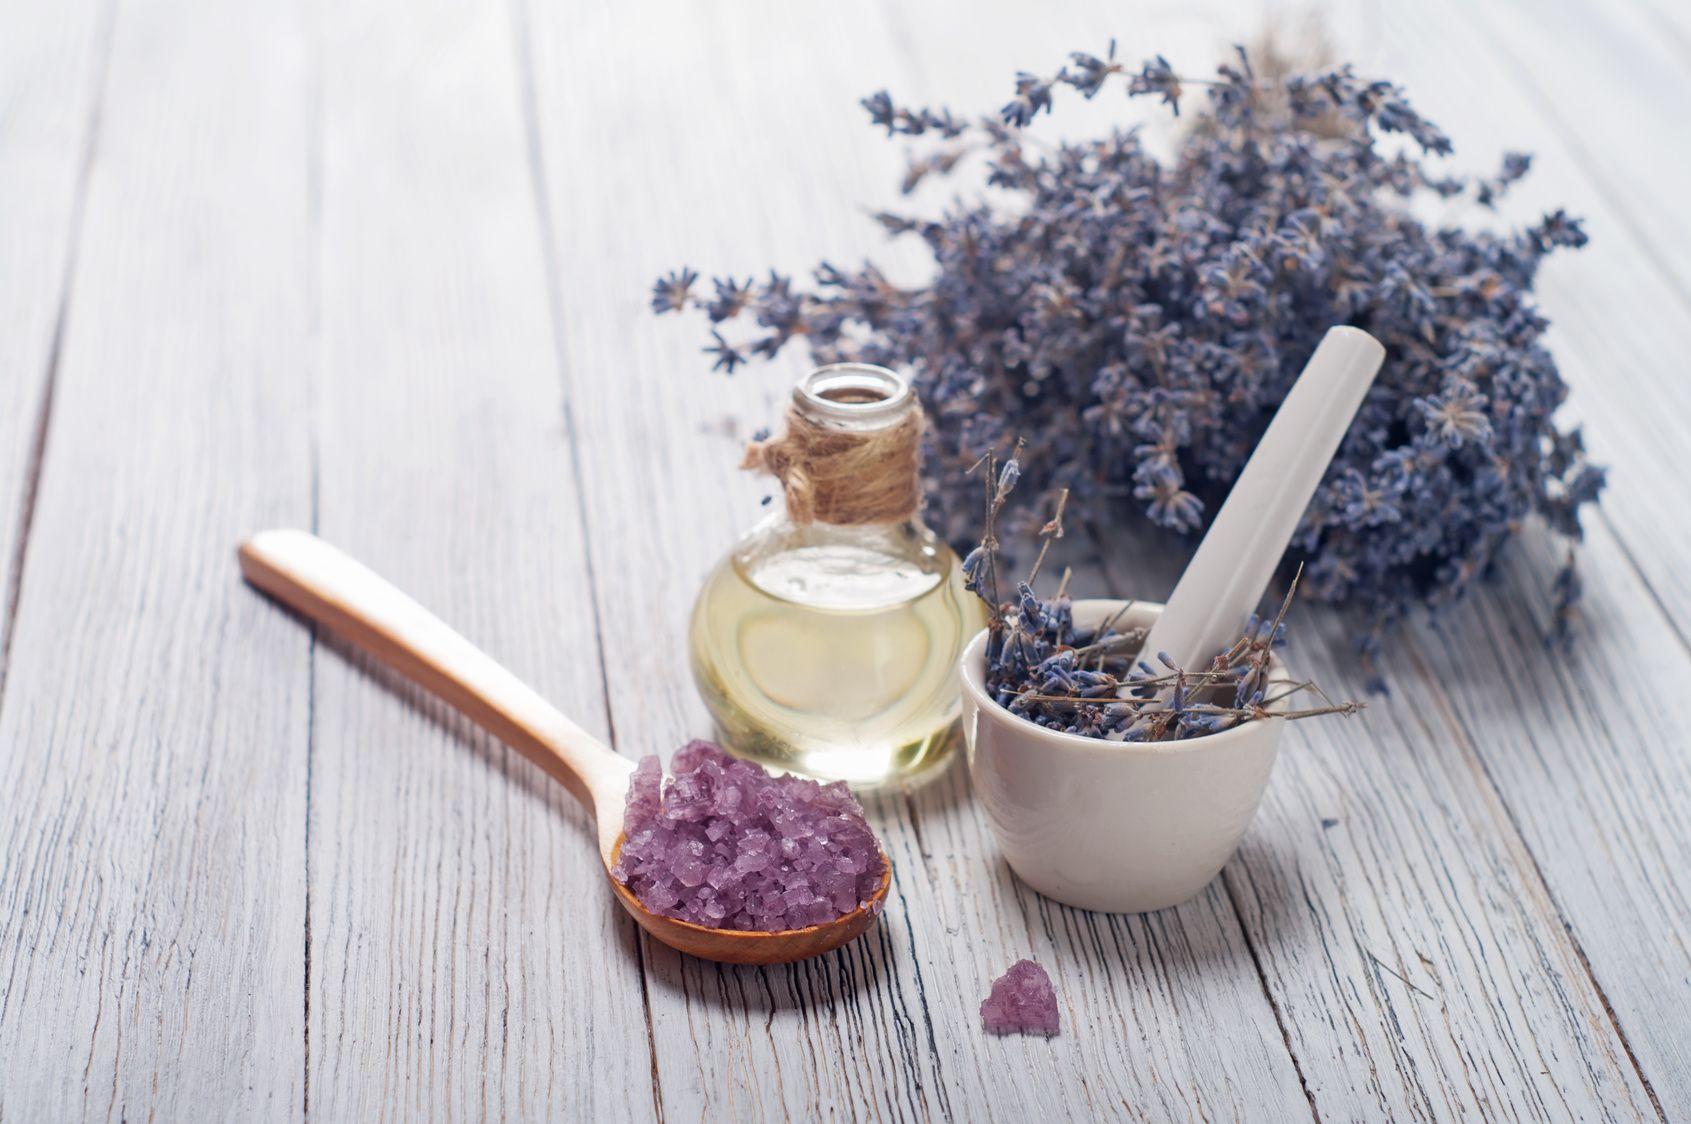 Lavender flowers. Spa elements.